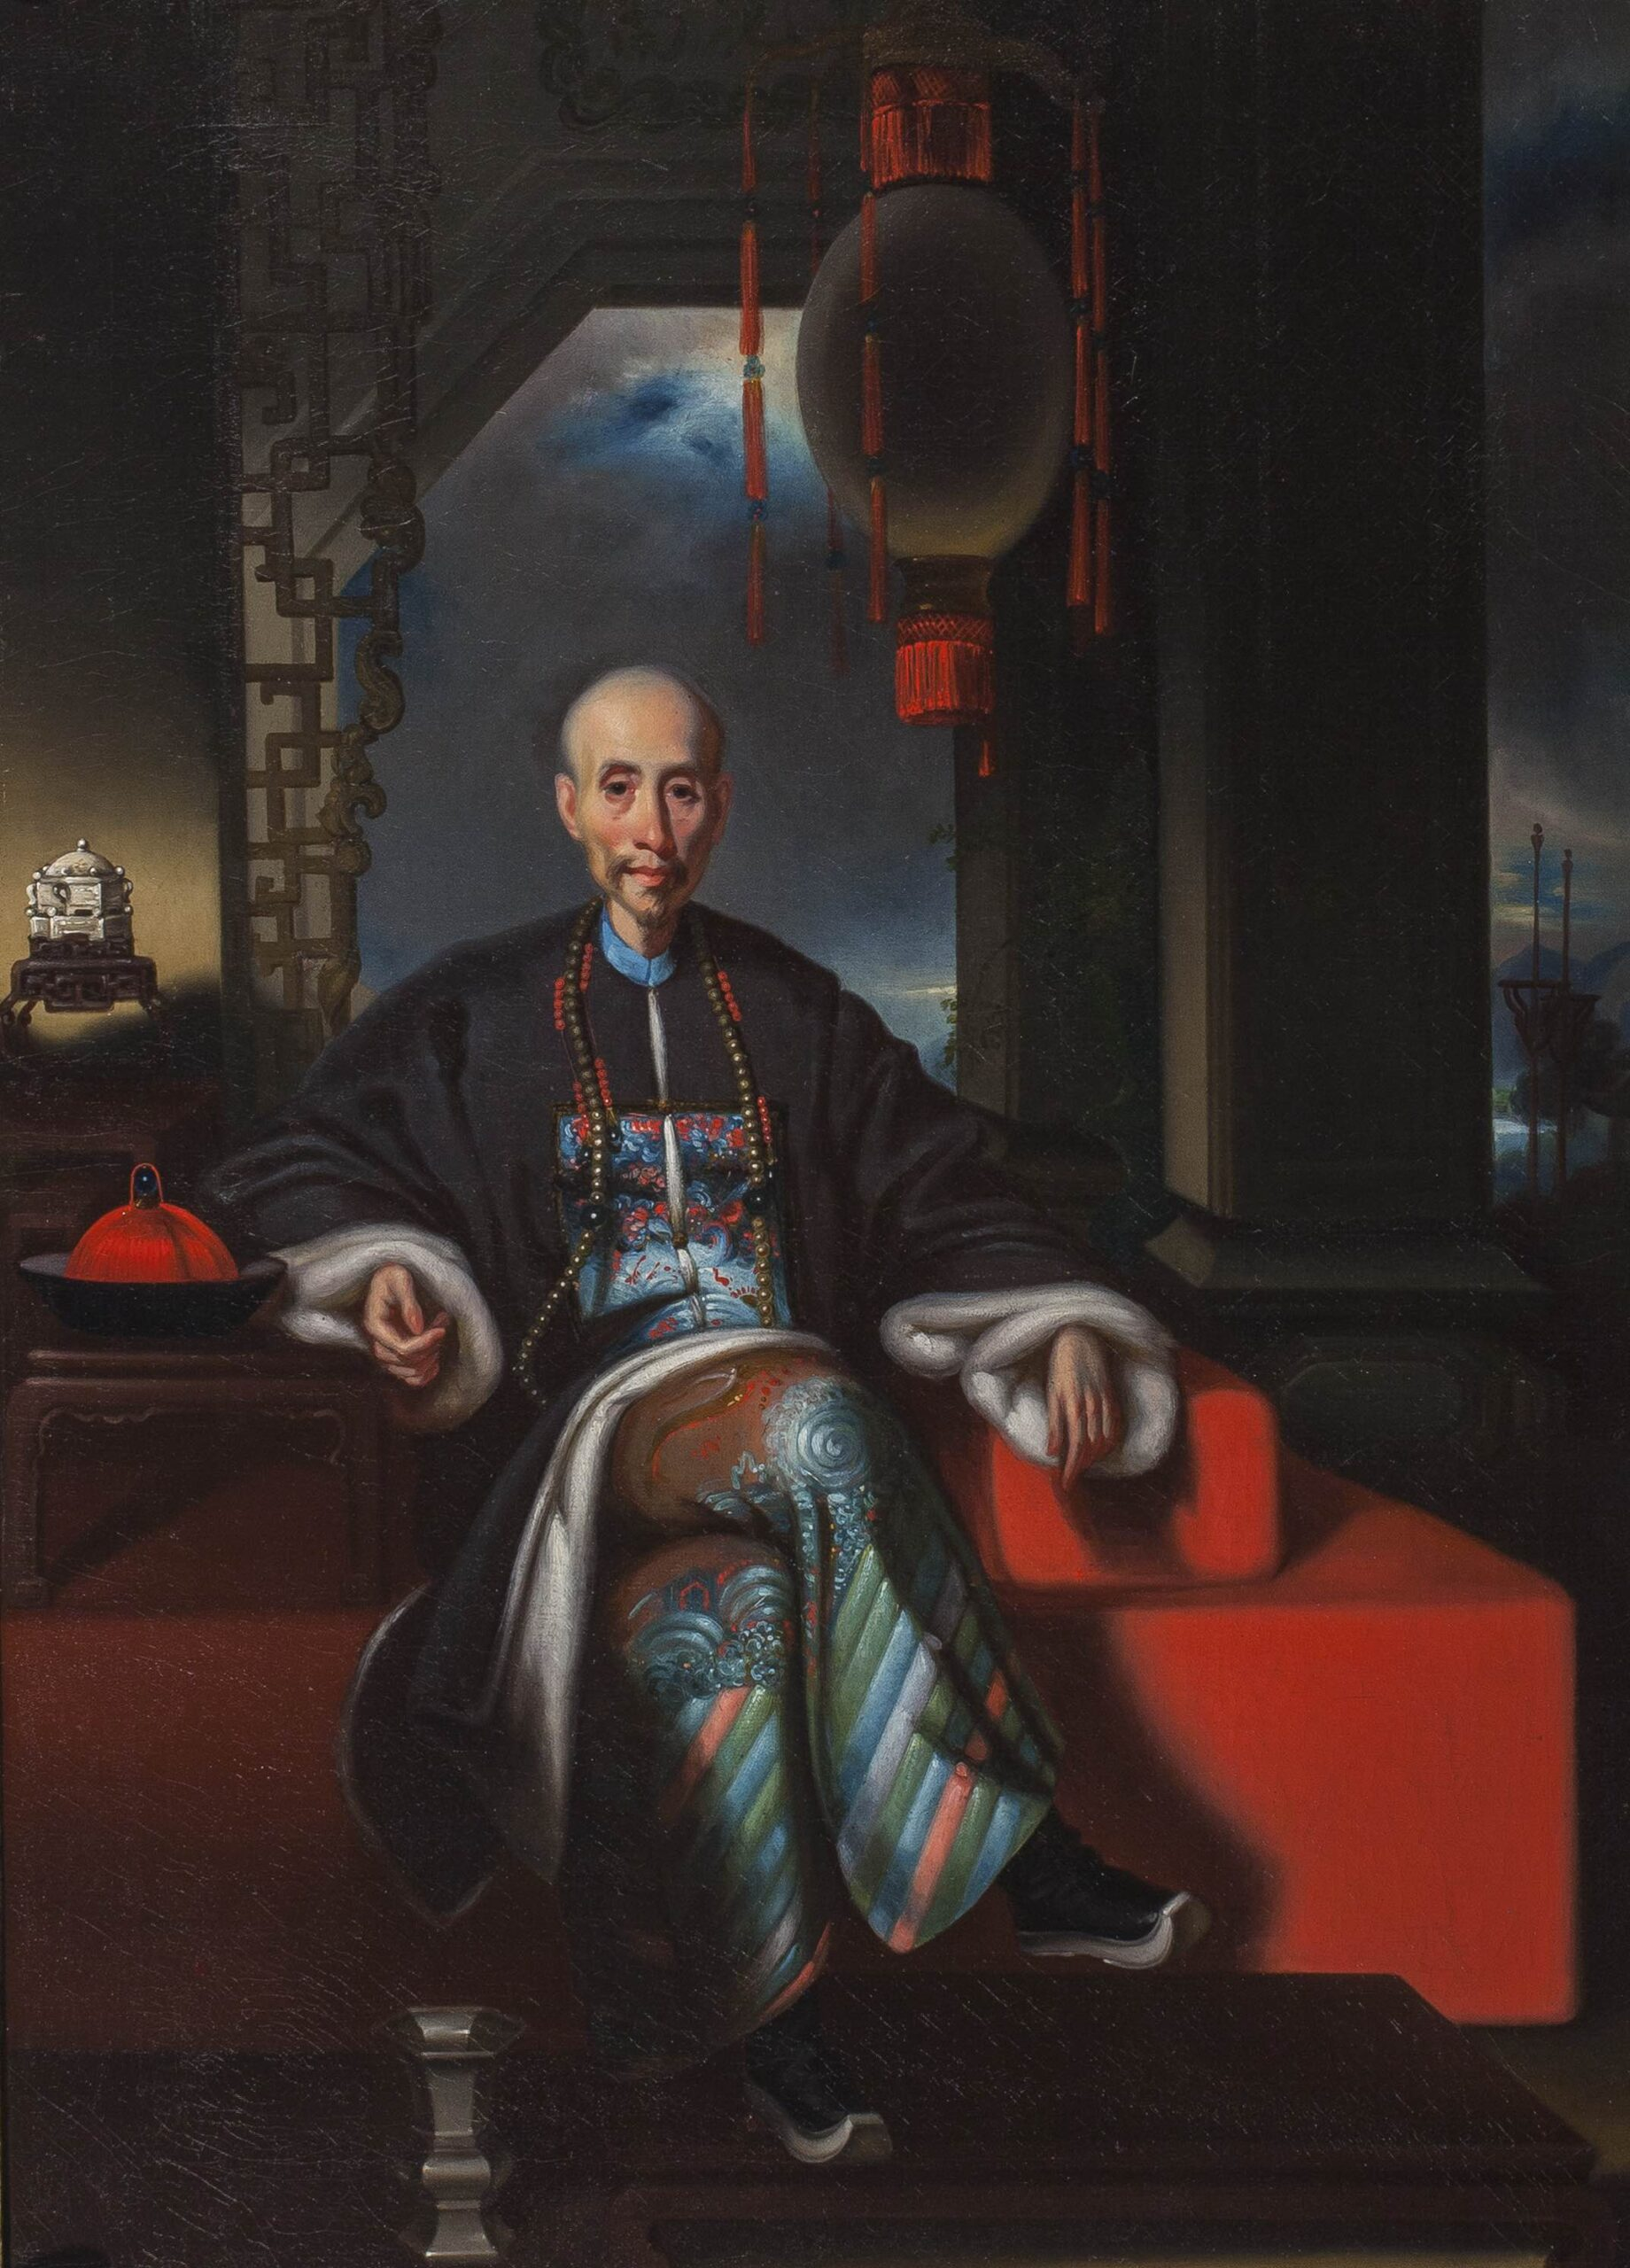 Lamqua or studio c. 1850 | Portrait of the 'hong merchant' Howqua | Oil on canvas, 25 x 19 1/4 in (63.5 x 48.8 cm)